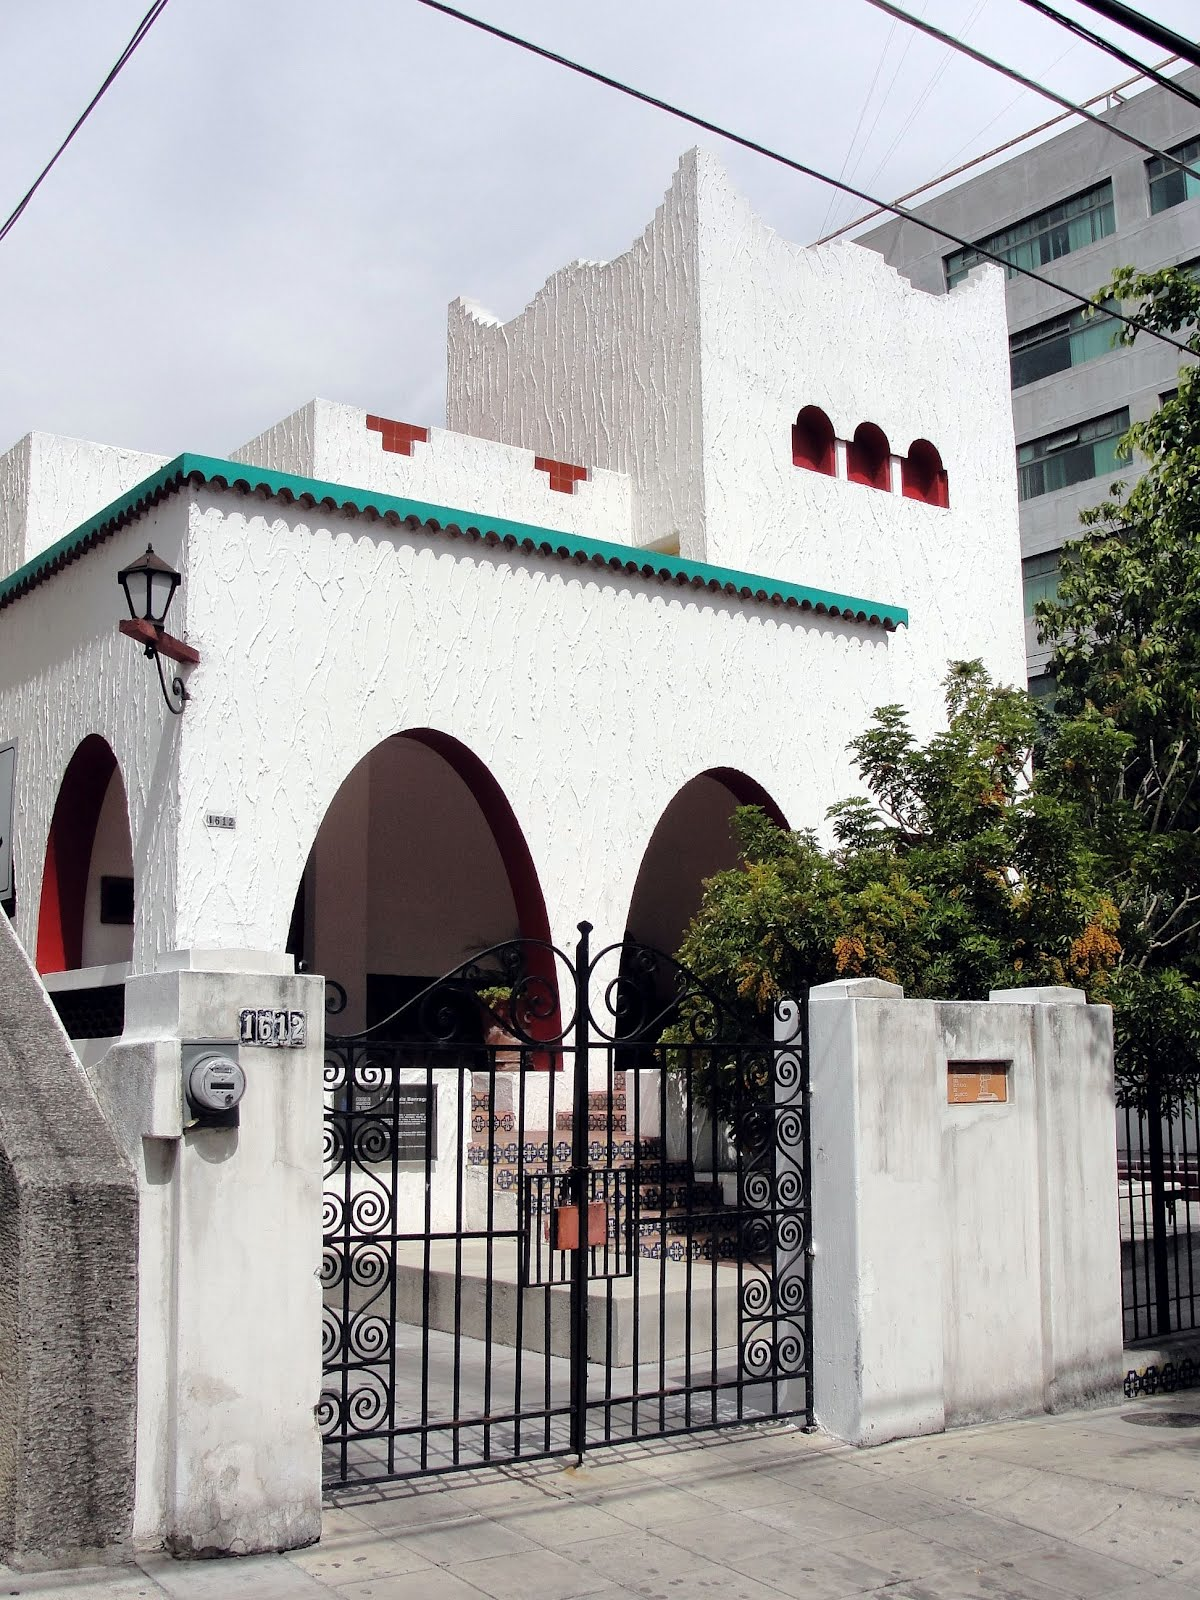 Revisiones de guadalajara ficha pedro moreno 1612 for Casa de diseno guadalajara